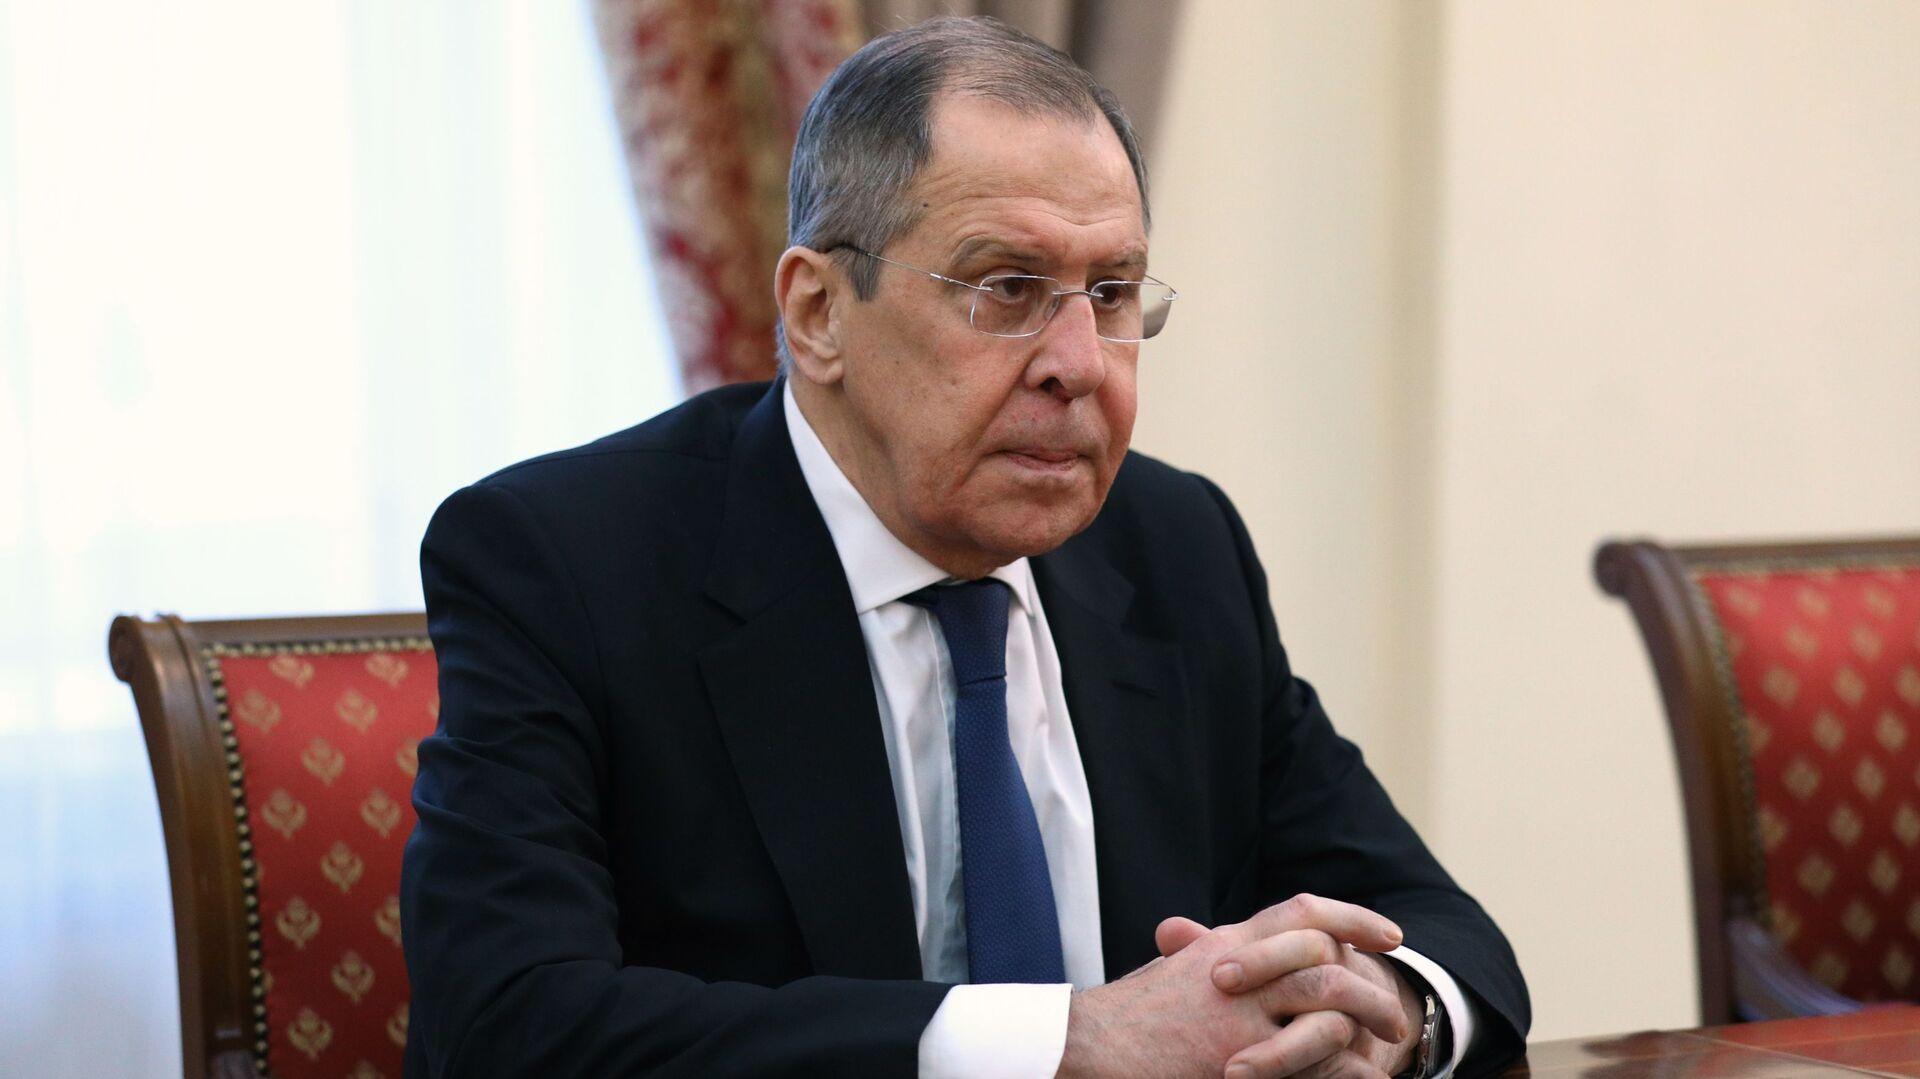 La visita oficial del ministro de Exteriores ruso, Serguéi Lavrov, a Ereván - Sputnik Mundo, 1920, 13.08.2021